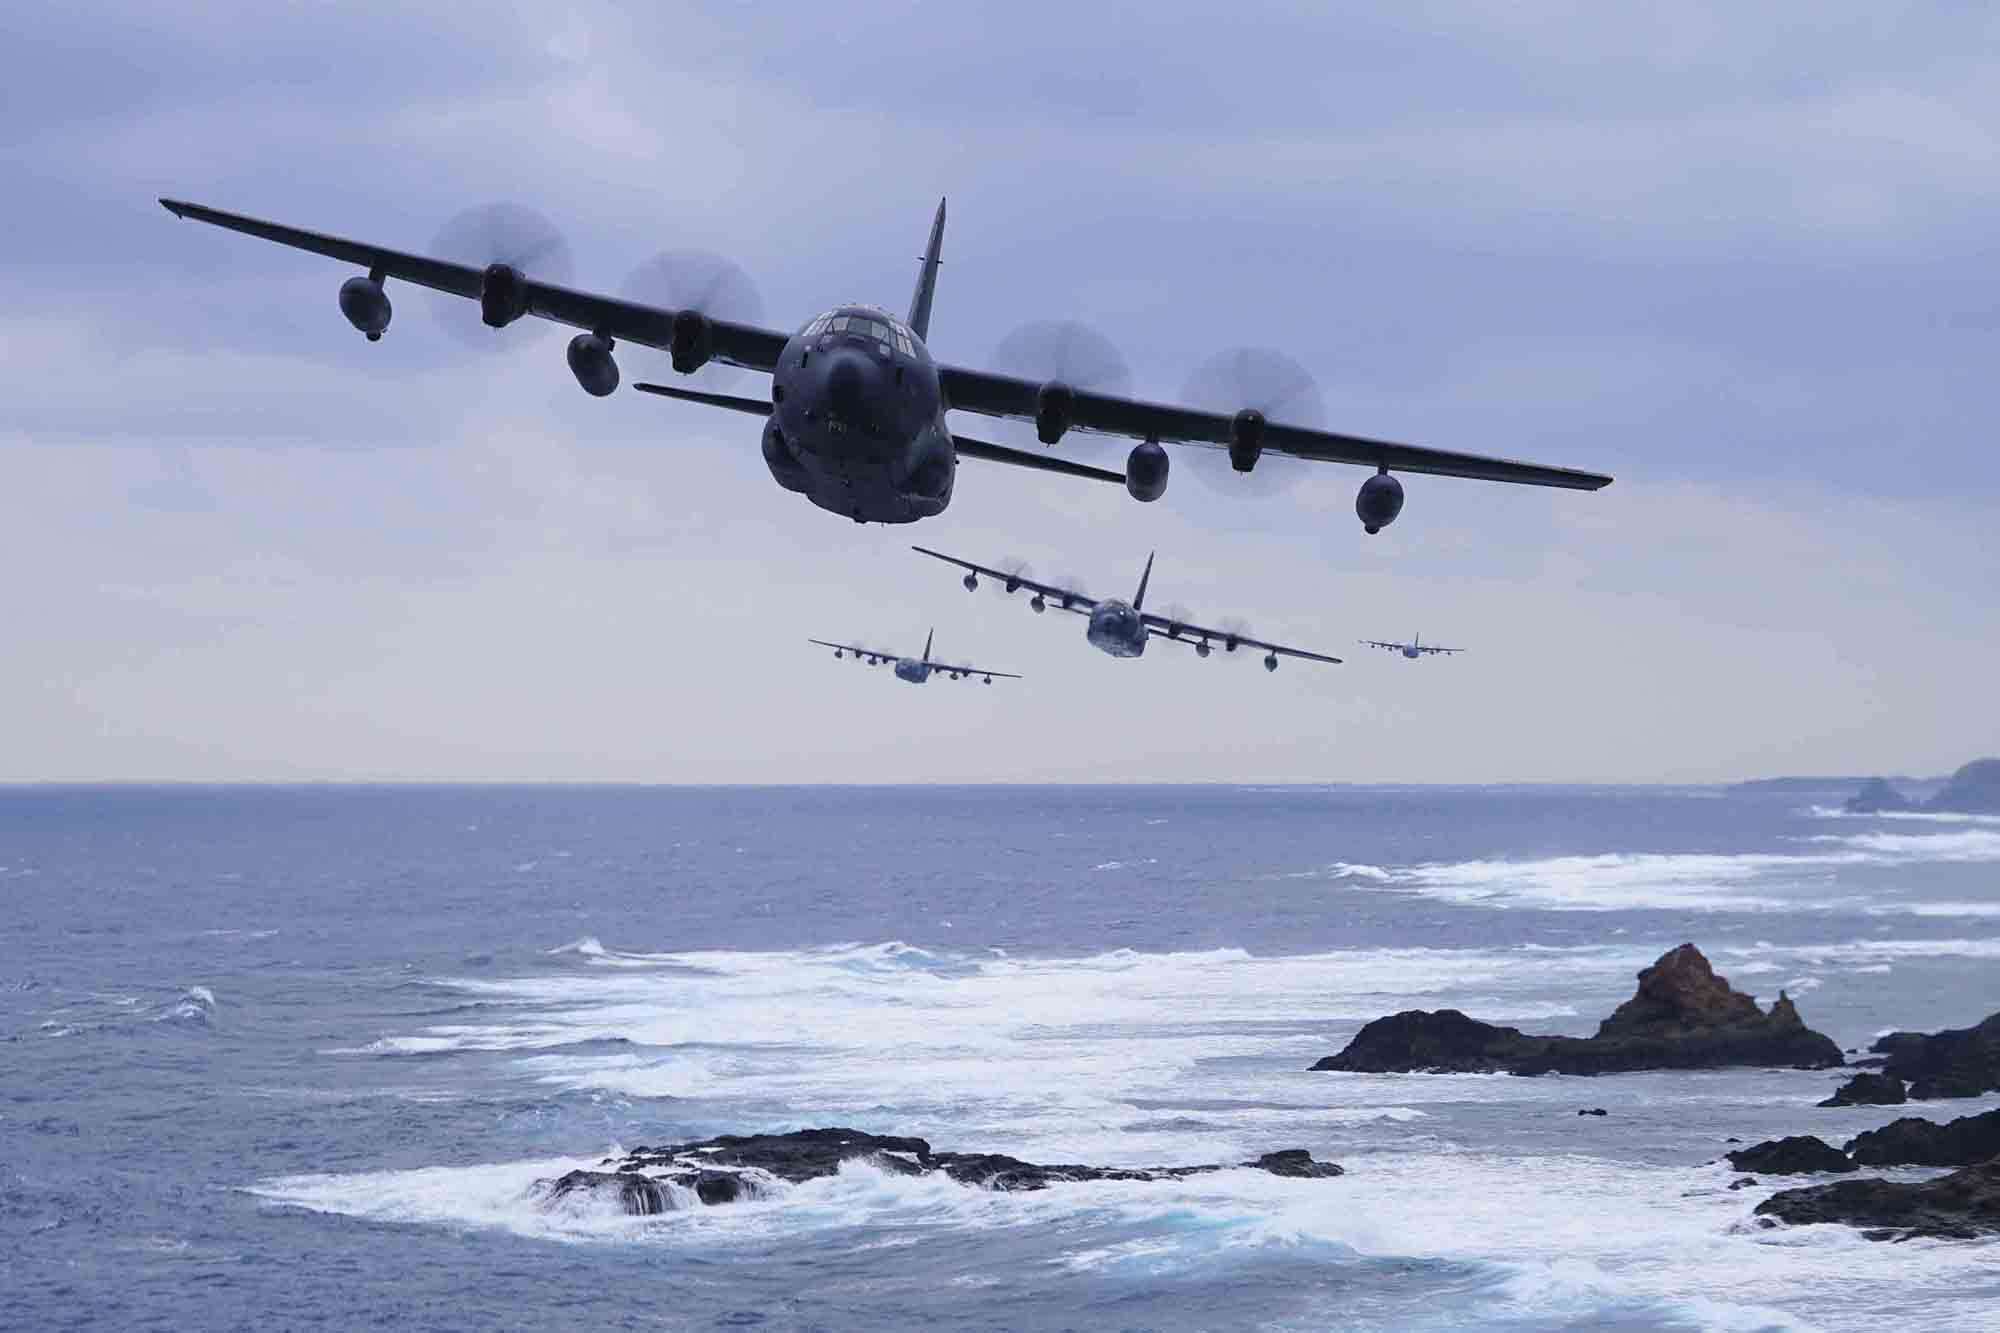 A formation of MC-130J Command IIs flies off the coast of Okinawa, Japan, on Jan. 6, 2021. (Capt. Renee Douglas/Air Force)